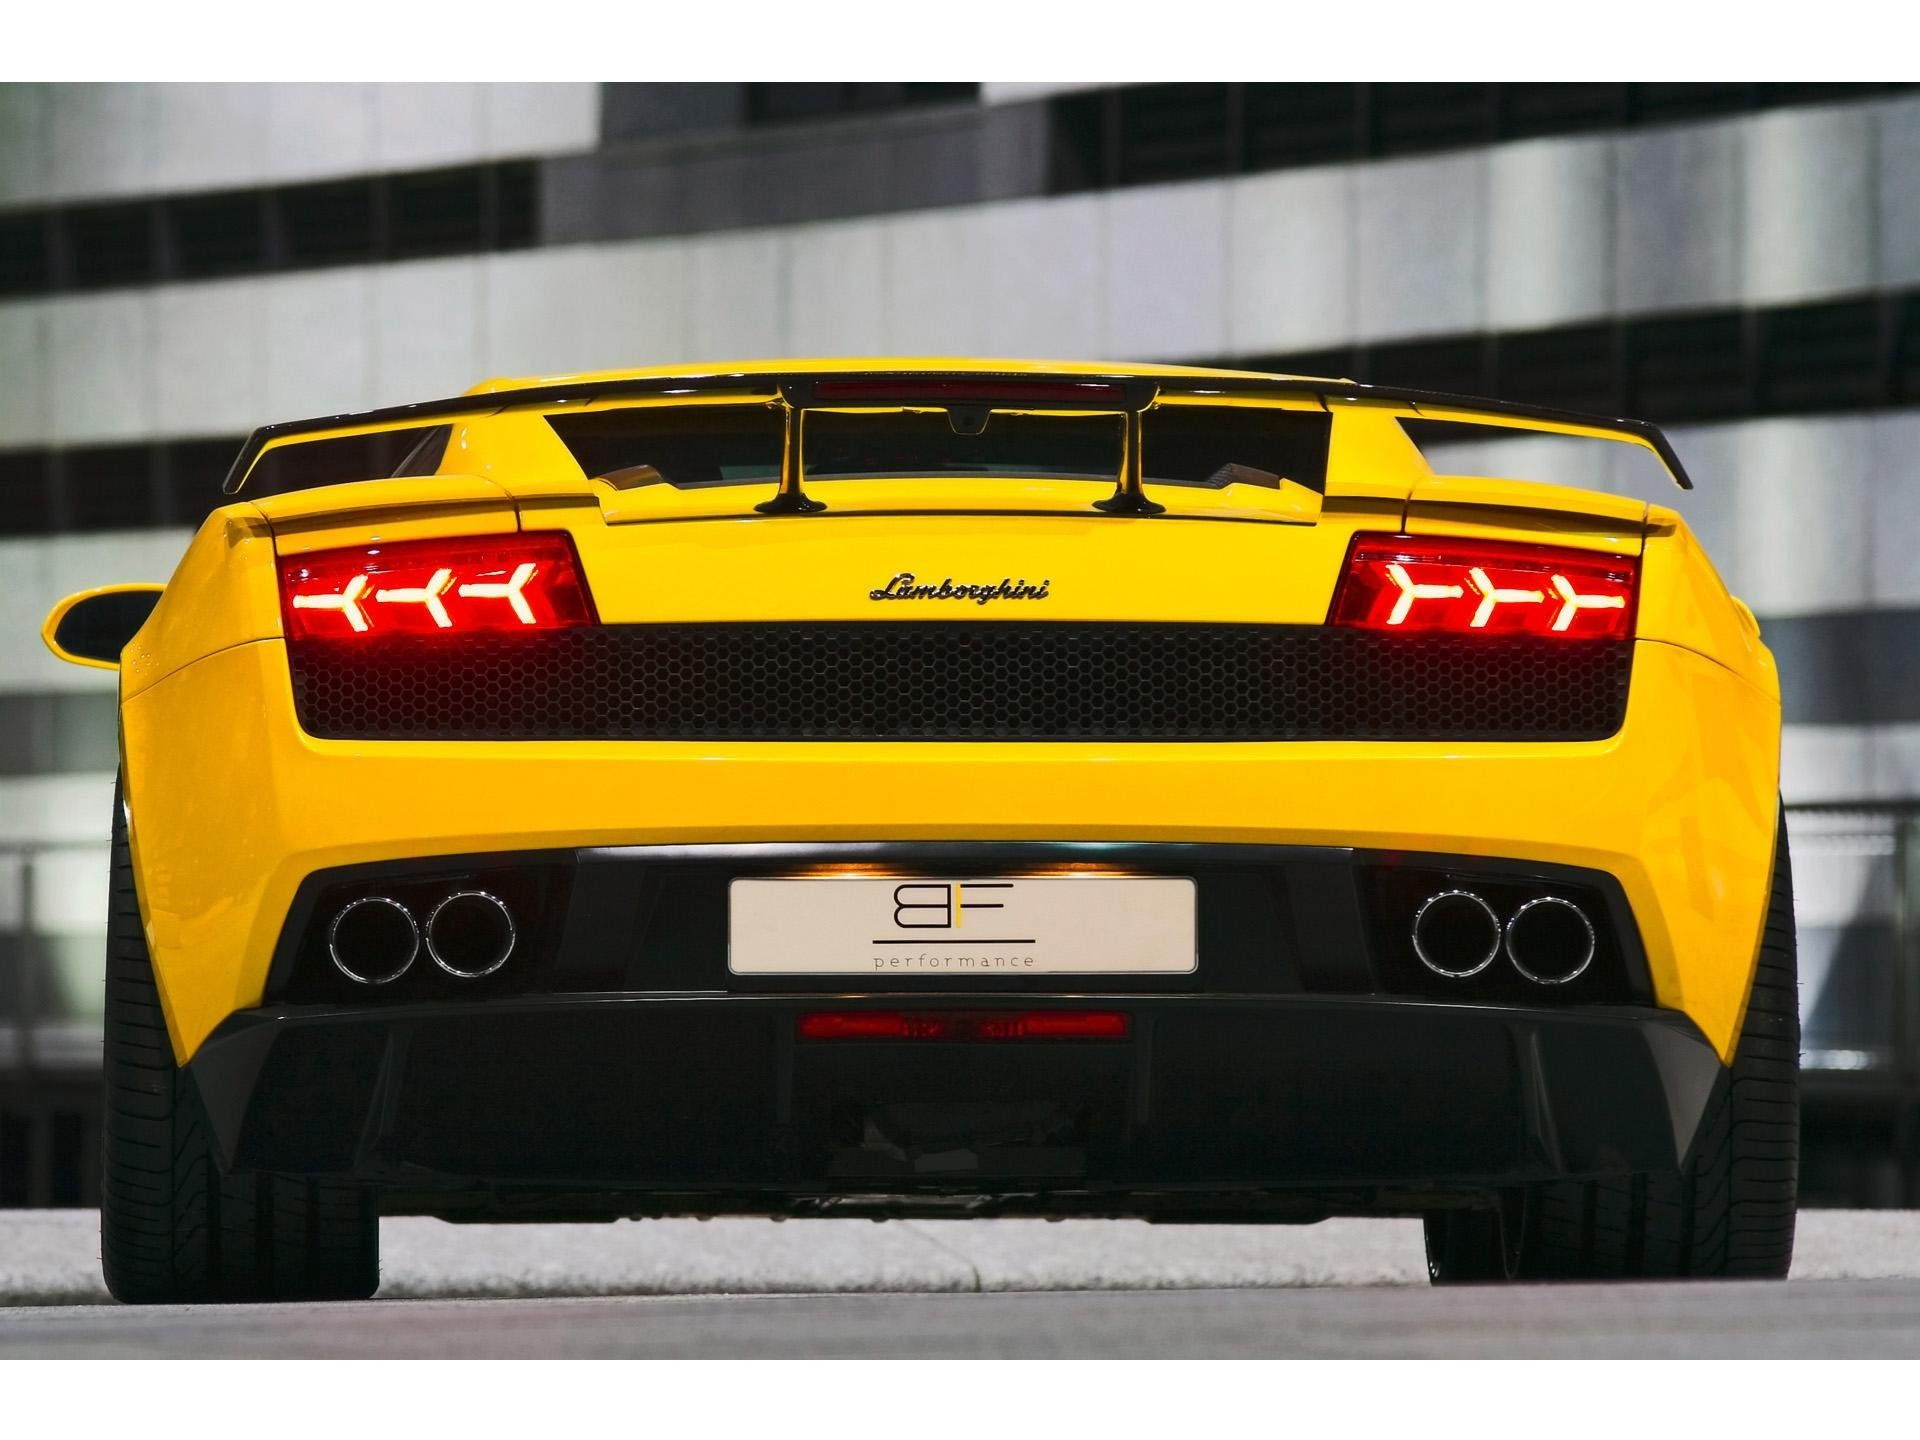 Lamborghini Cars Wallpaper (78+ images)